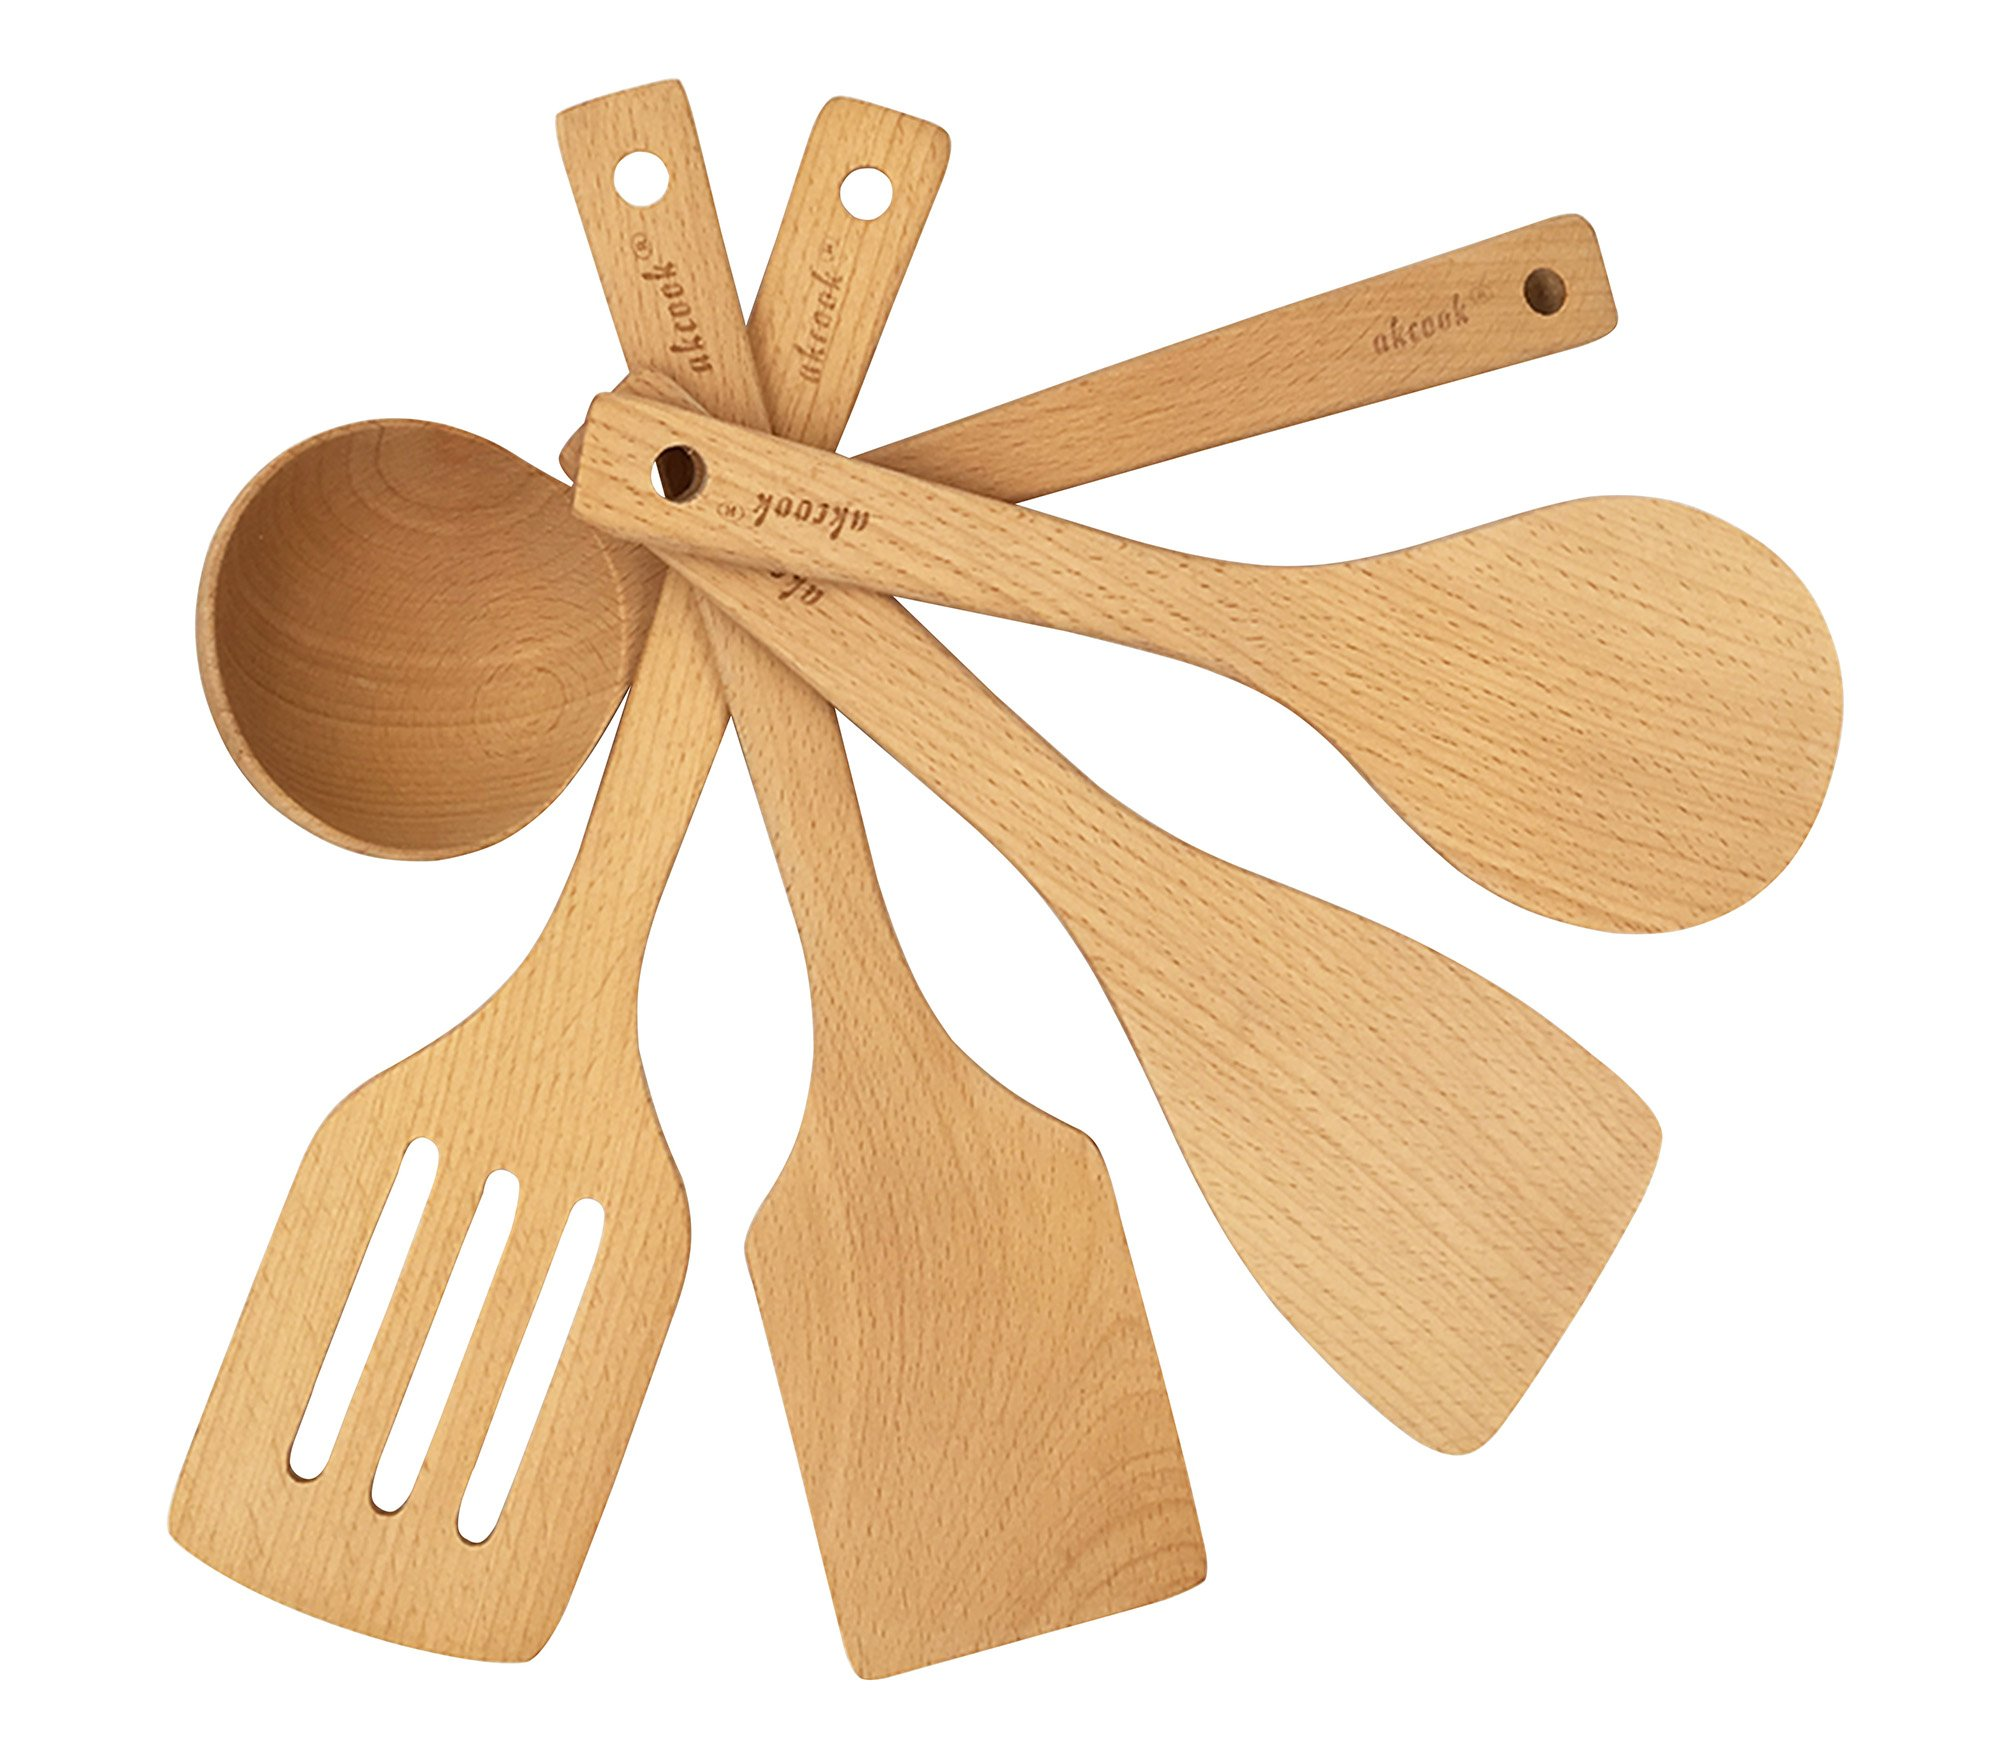 AKcook 5-Piece Cooking Tools Set, Wood Kitchen Utensils, Turner Spatula Ladle